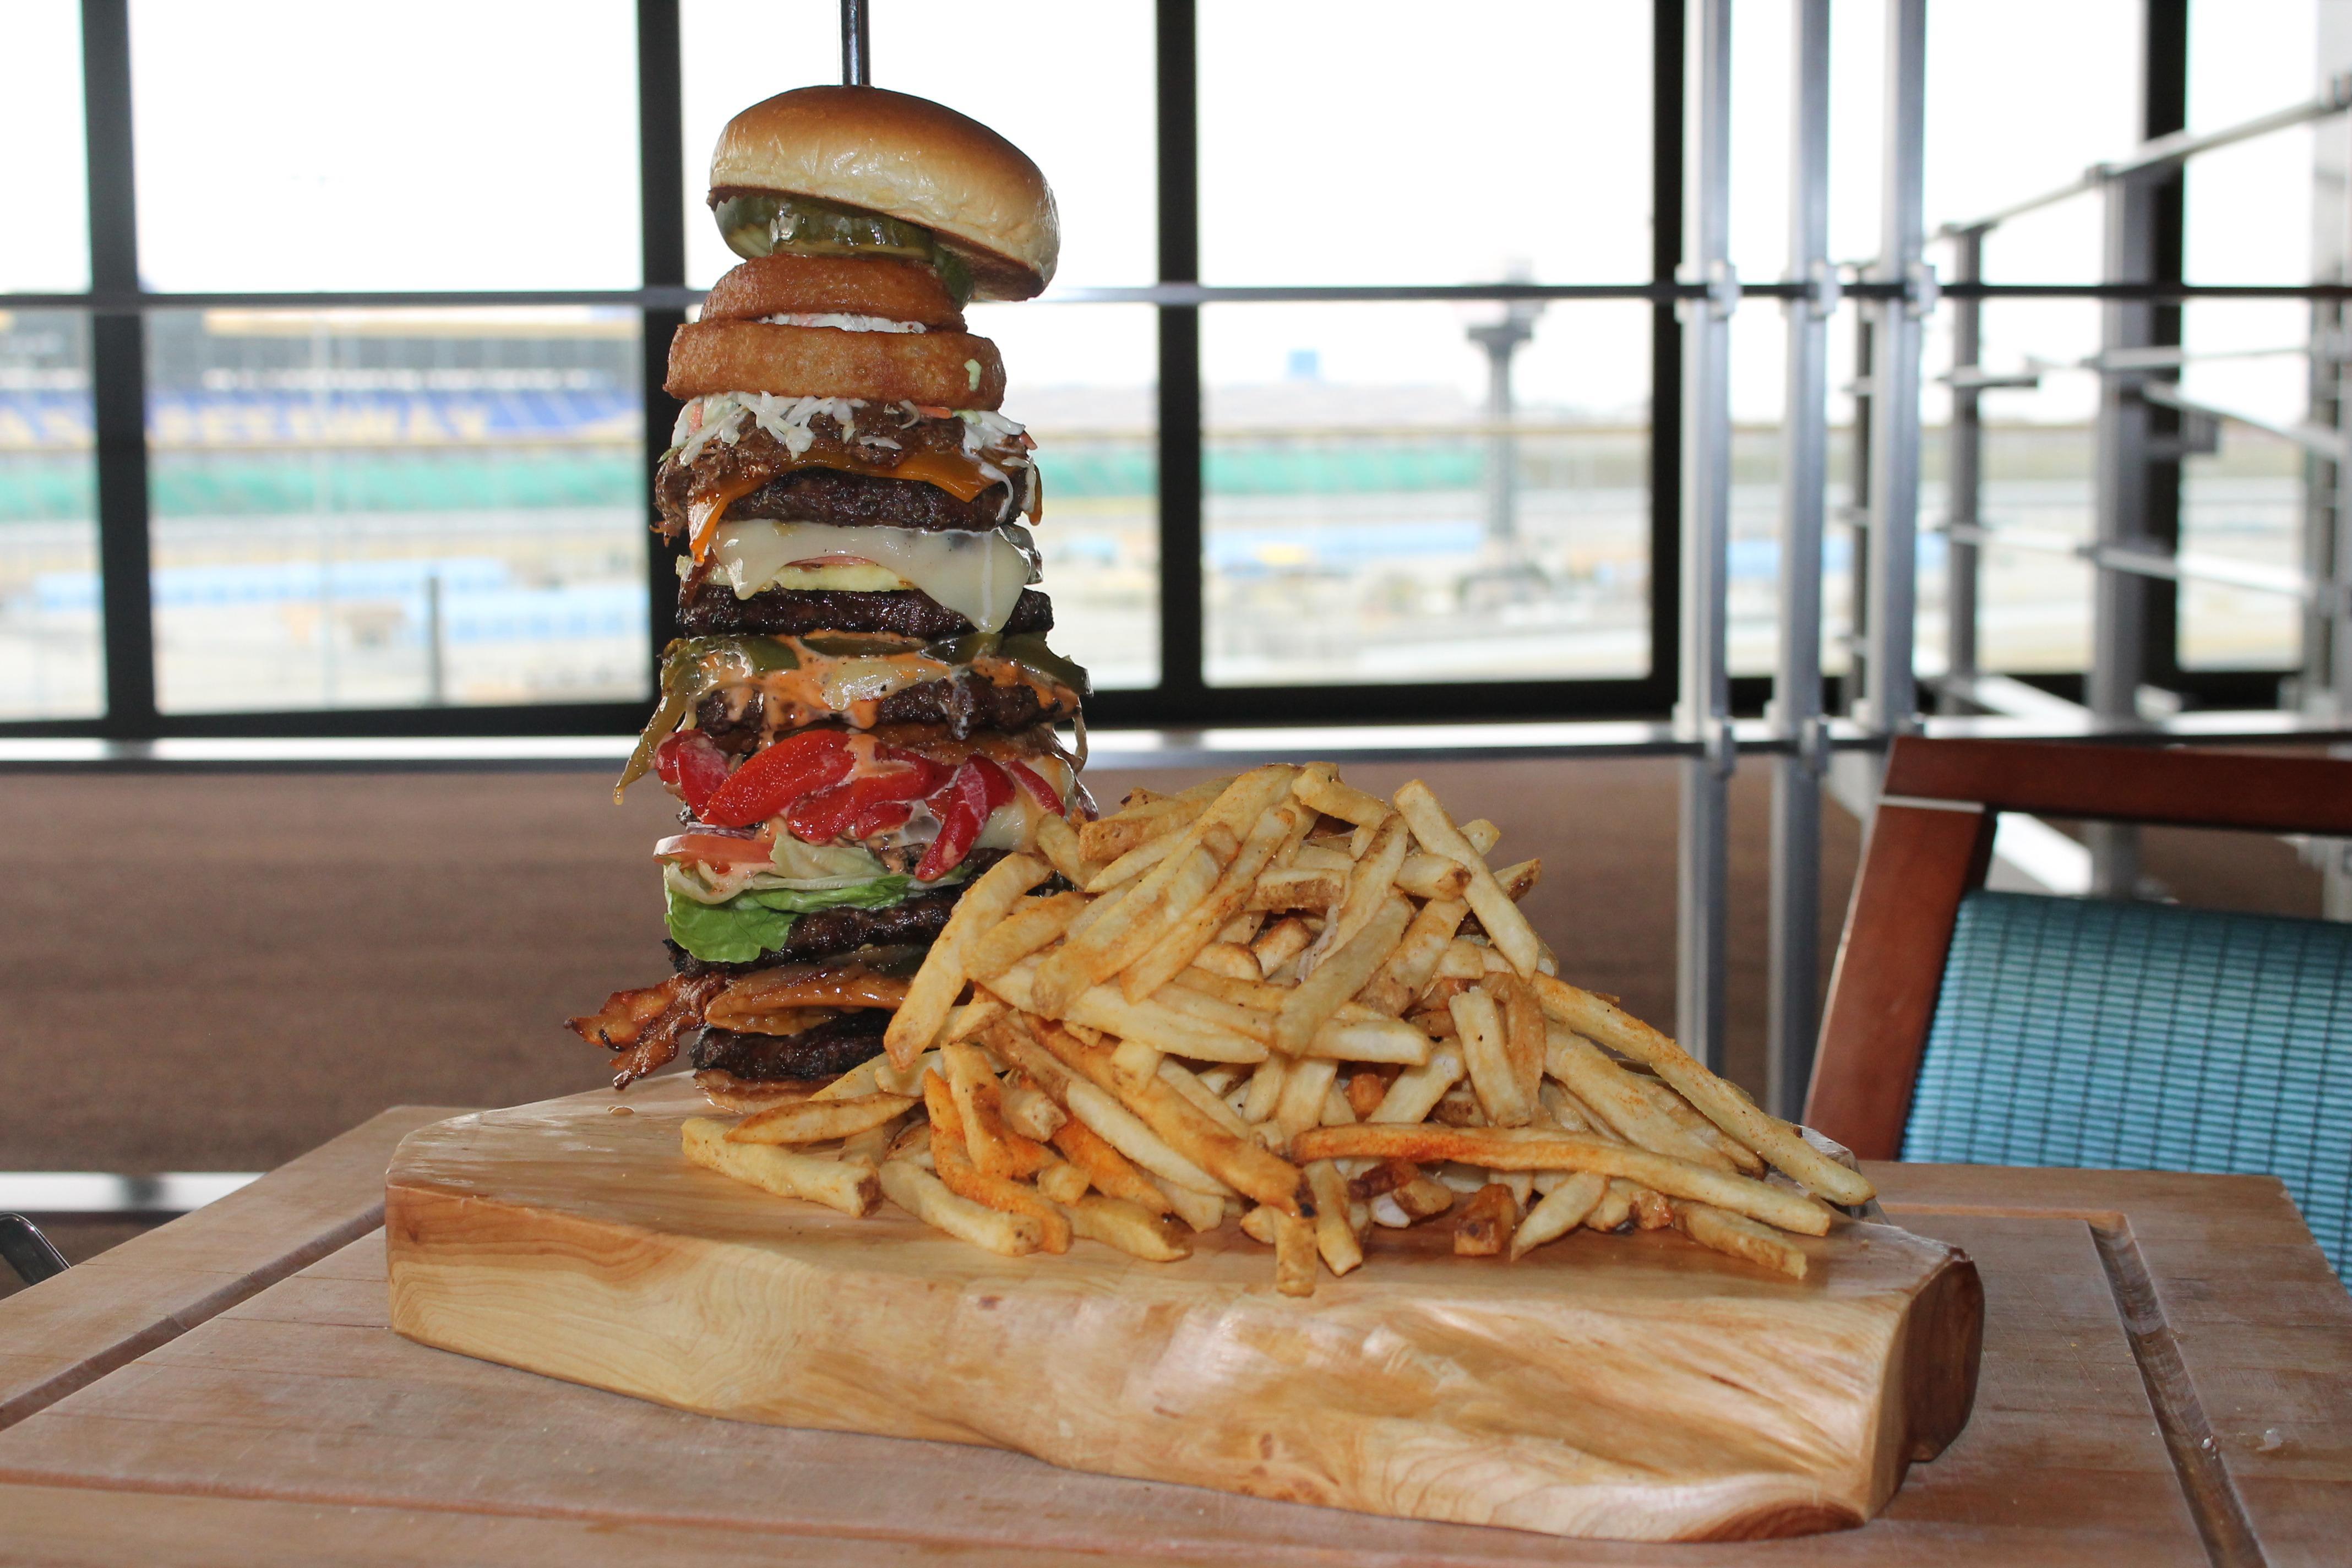 Turn 2 Sports Bar & Restaurant image 4